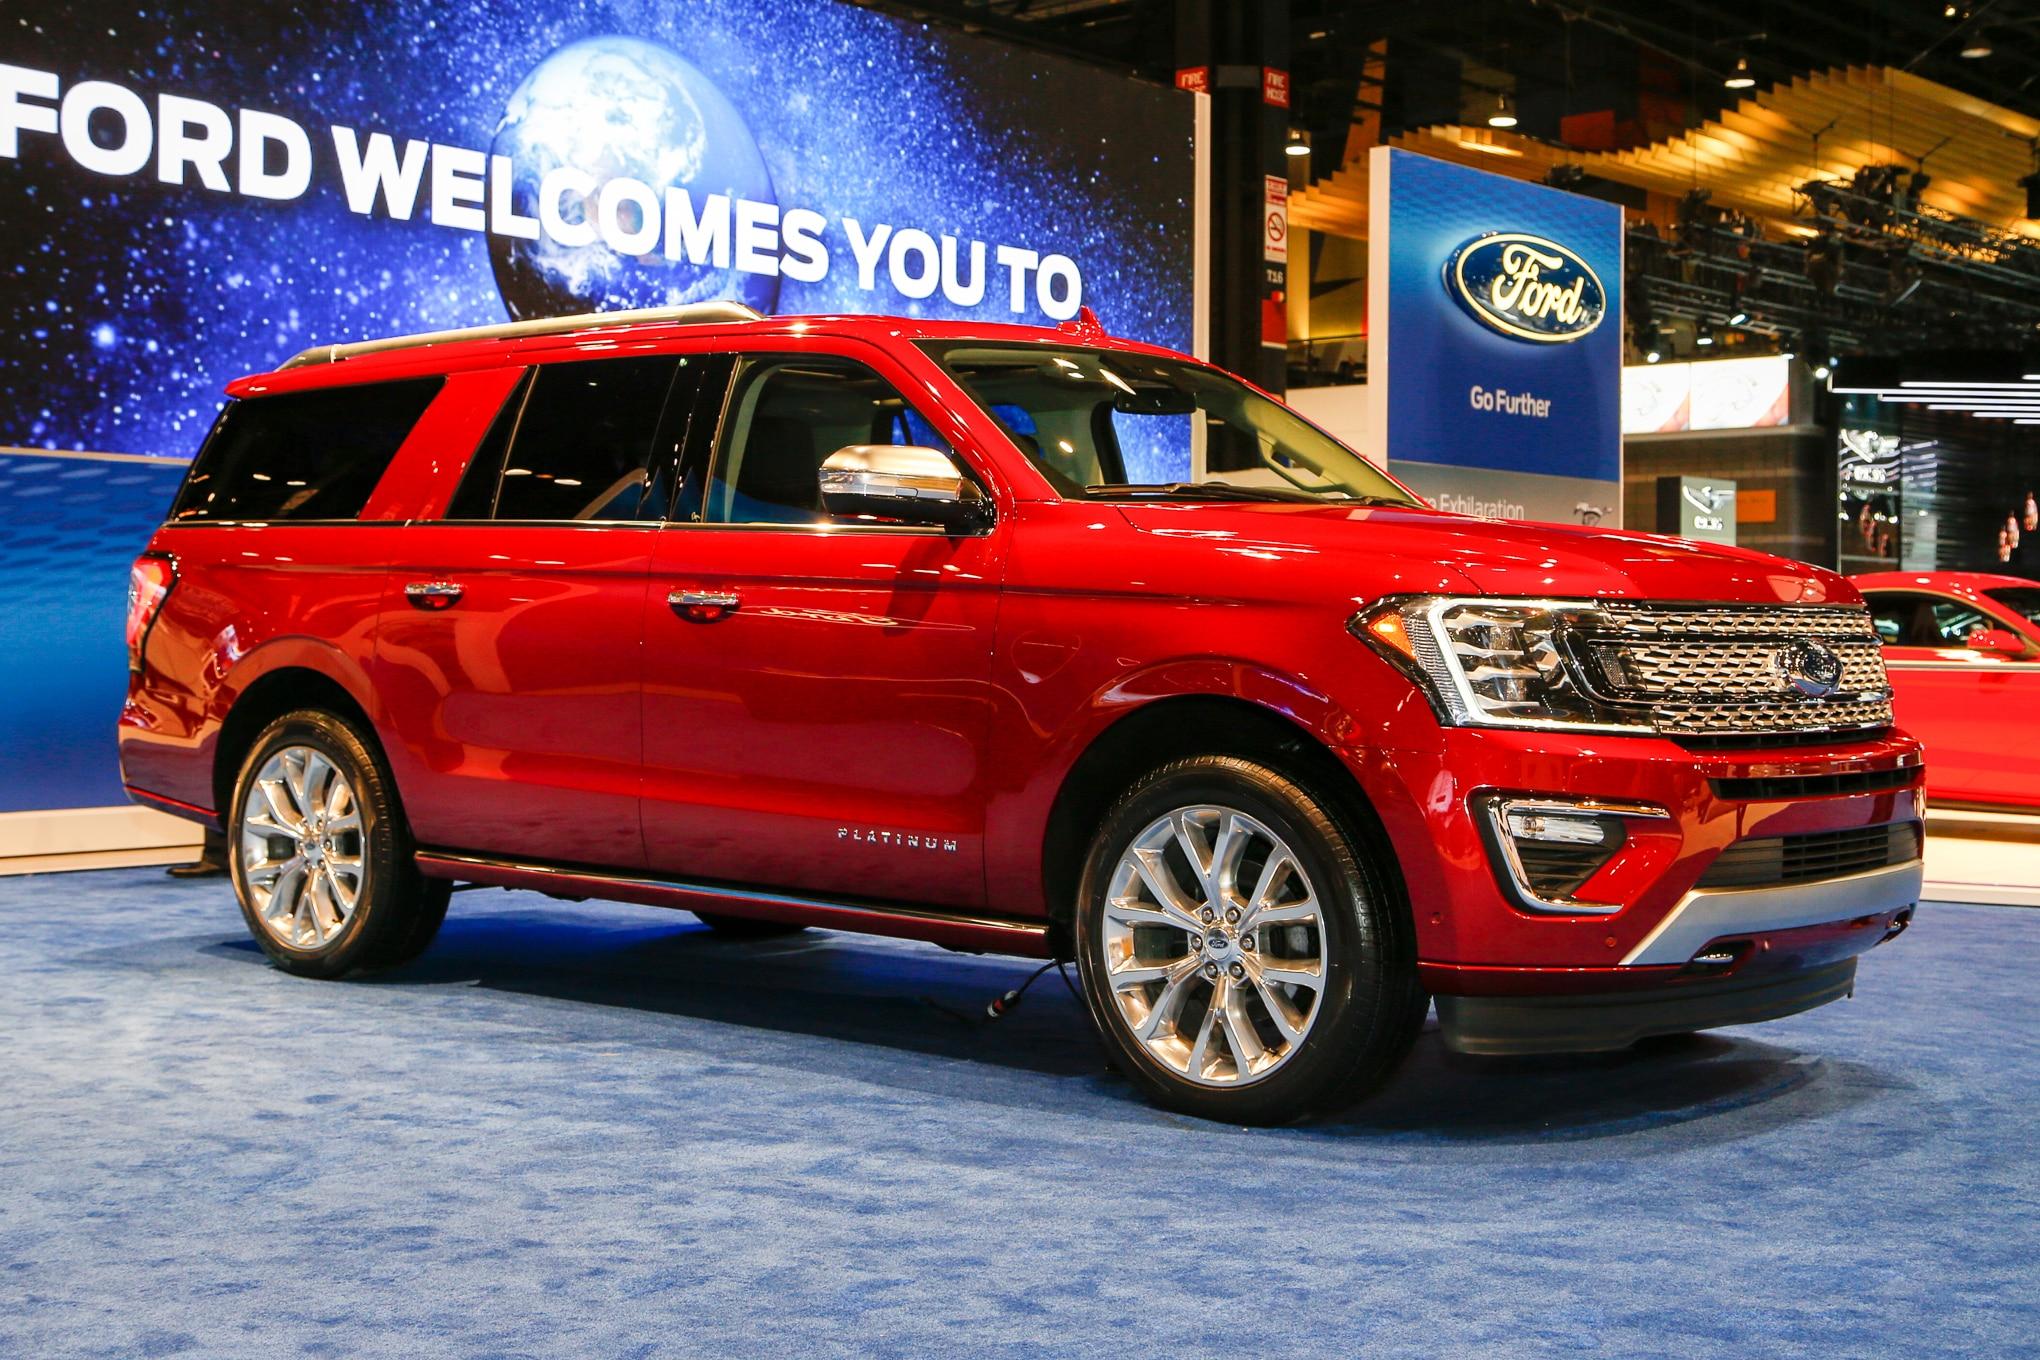 2018 Ford Expedition Platinum Front Three Quarter